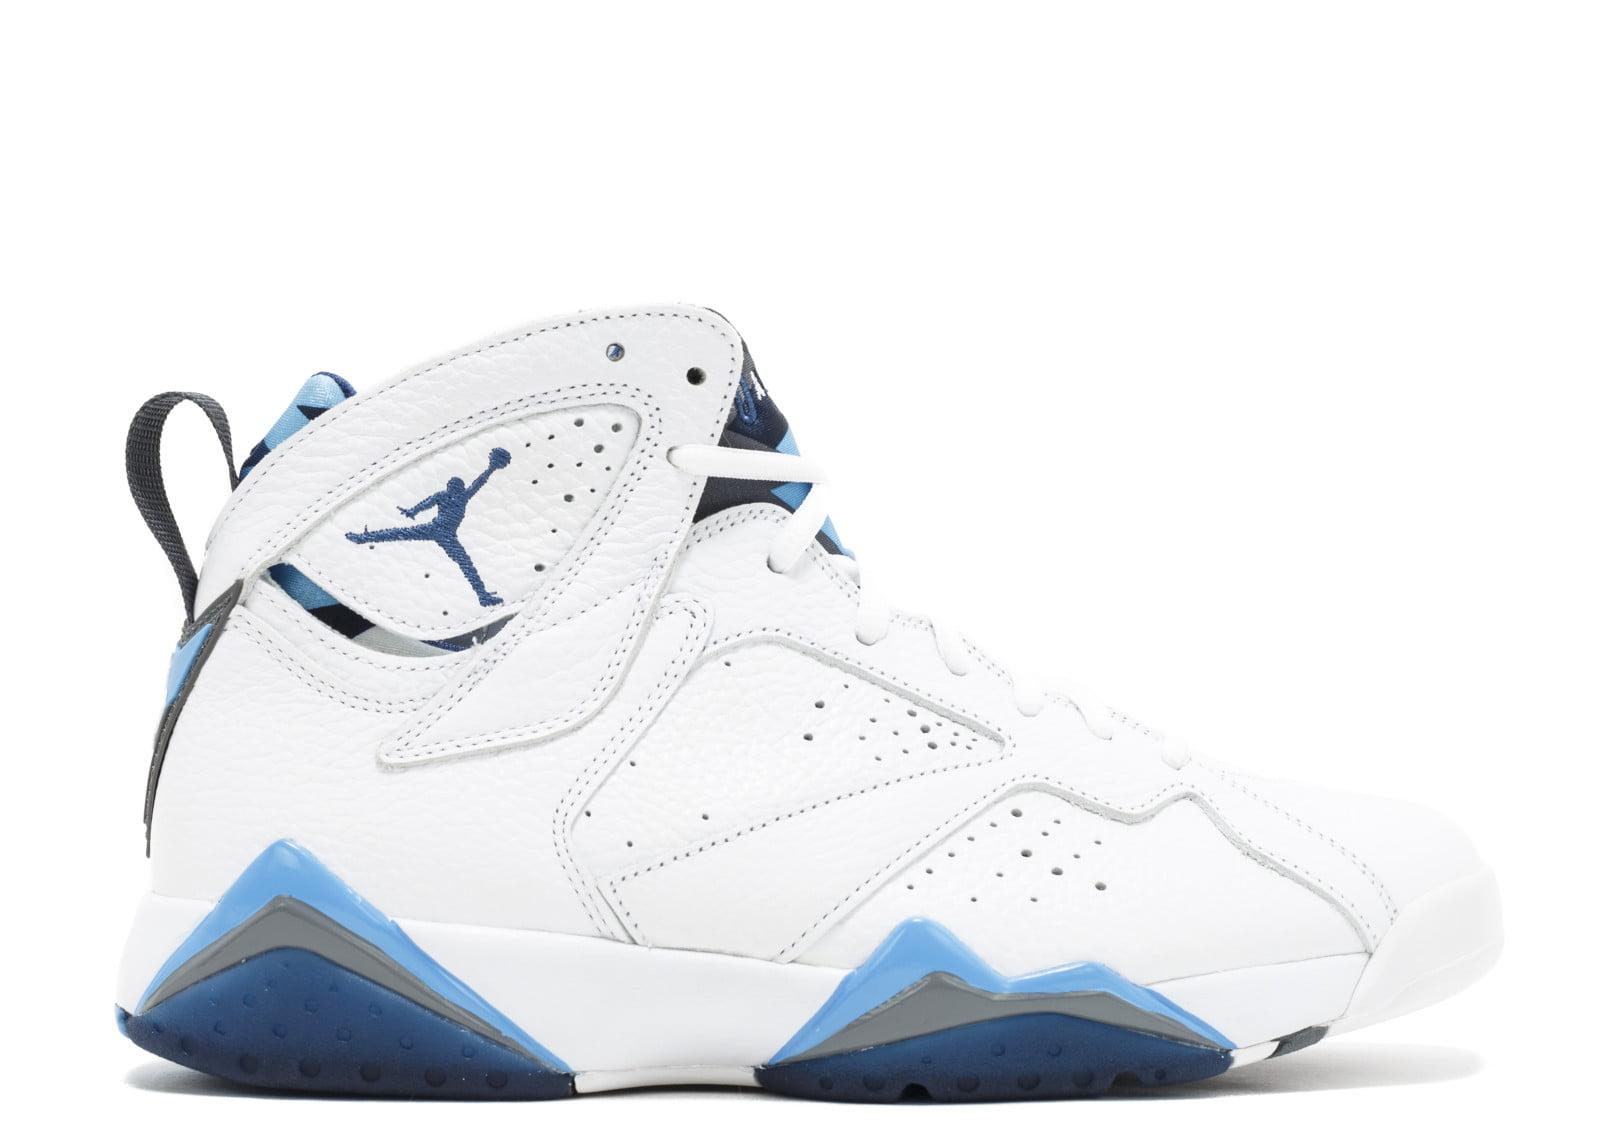 37c3af99016f Air Jordan - Men - Air Jordan 7 Retro  French Blue  - 304775-107 - Size 10